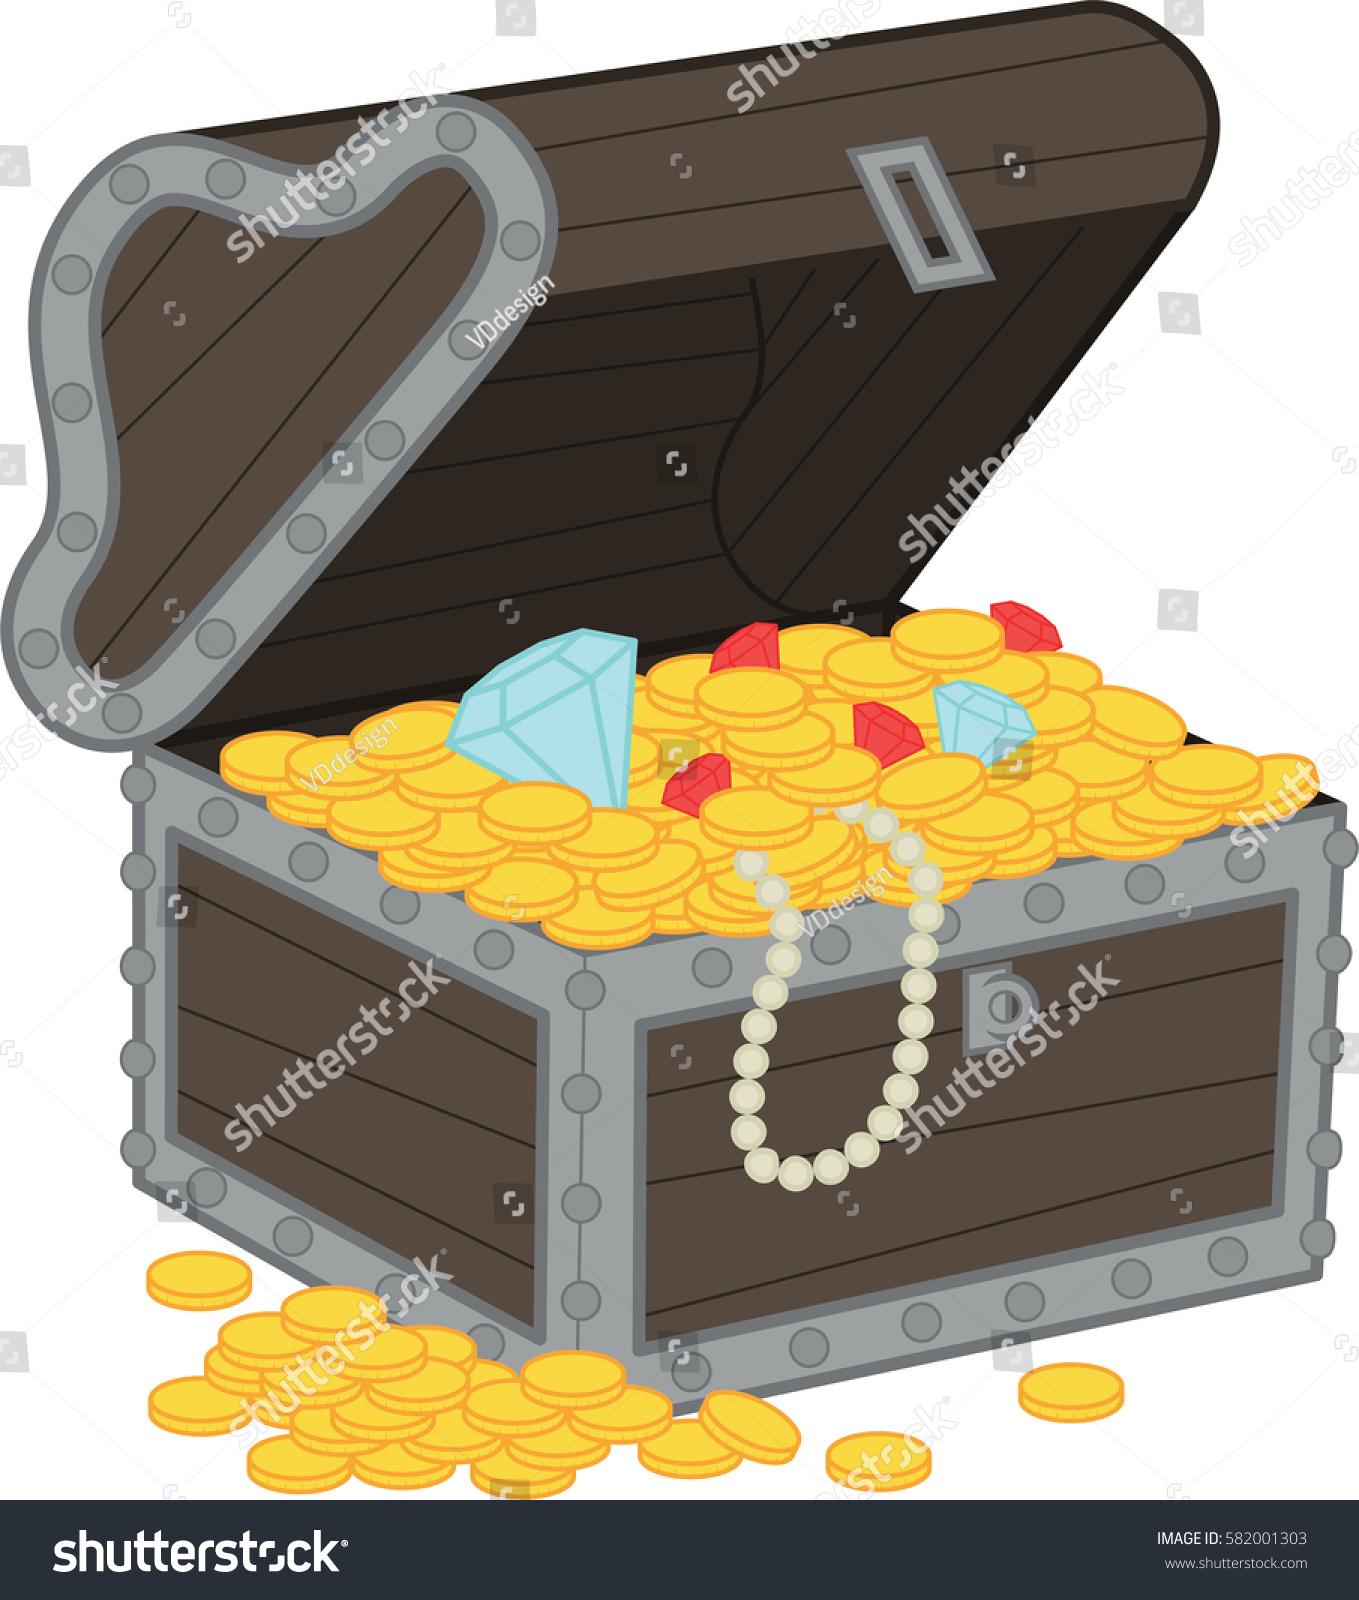 Vector Illustration Treasure Chest Stock Vector 582001303 ...